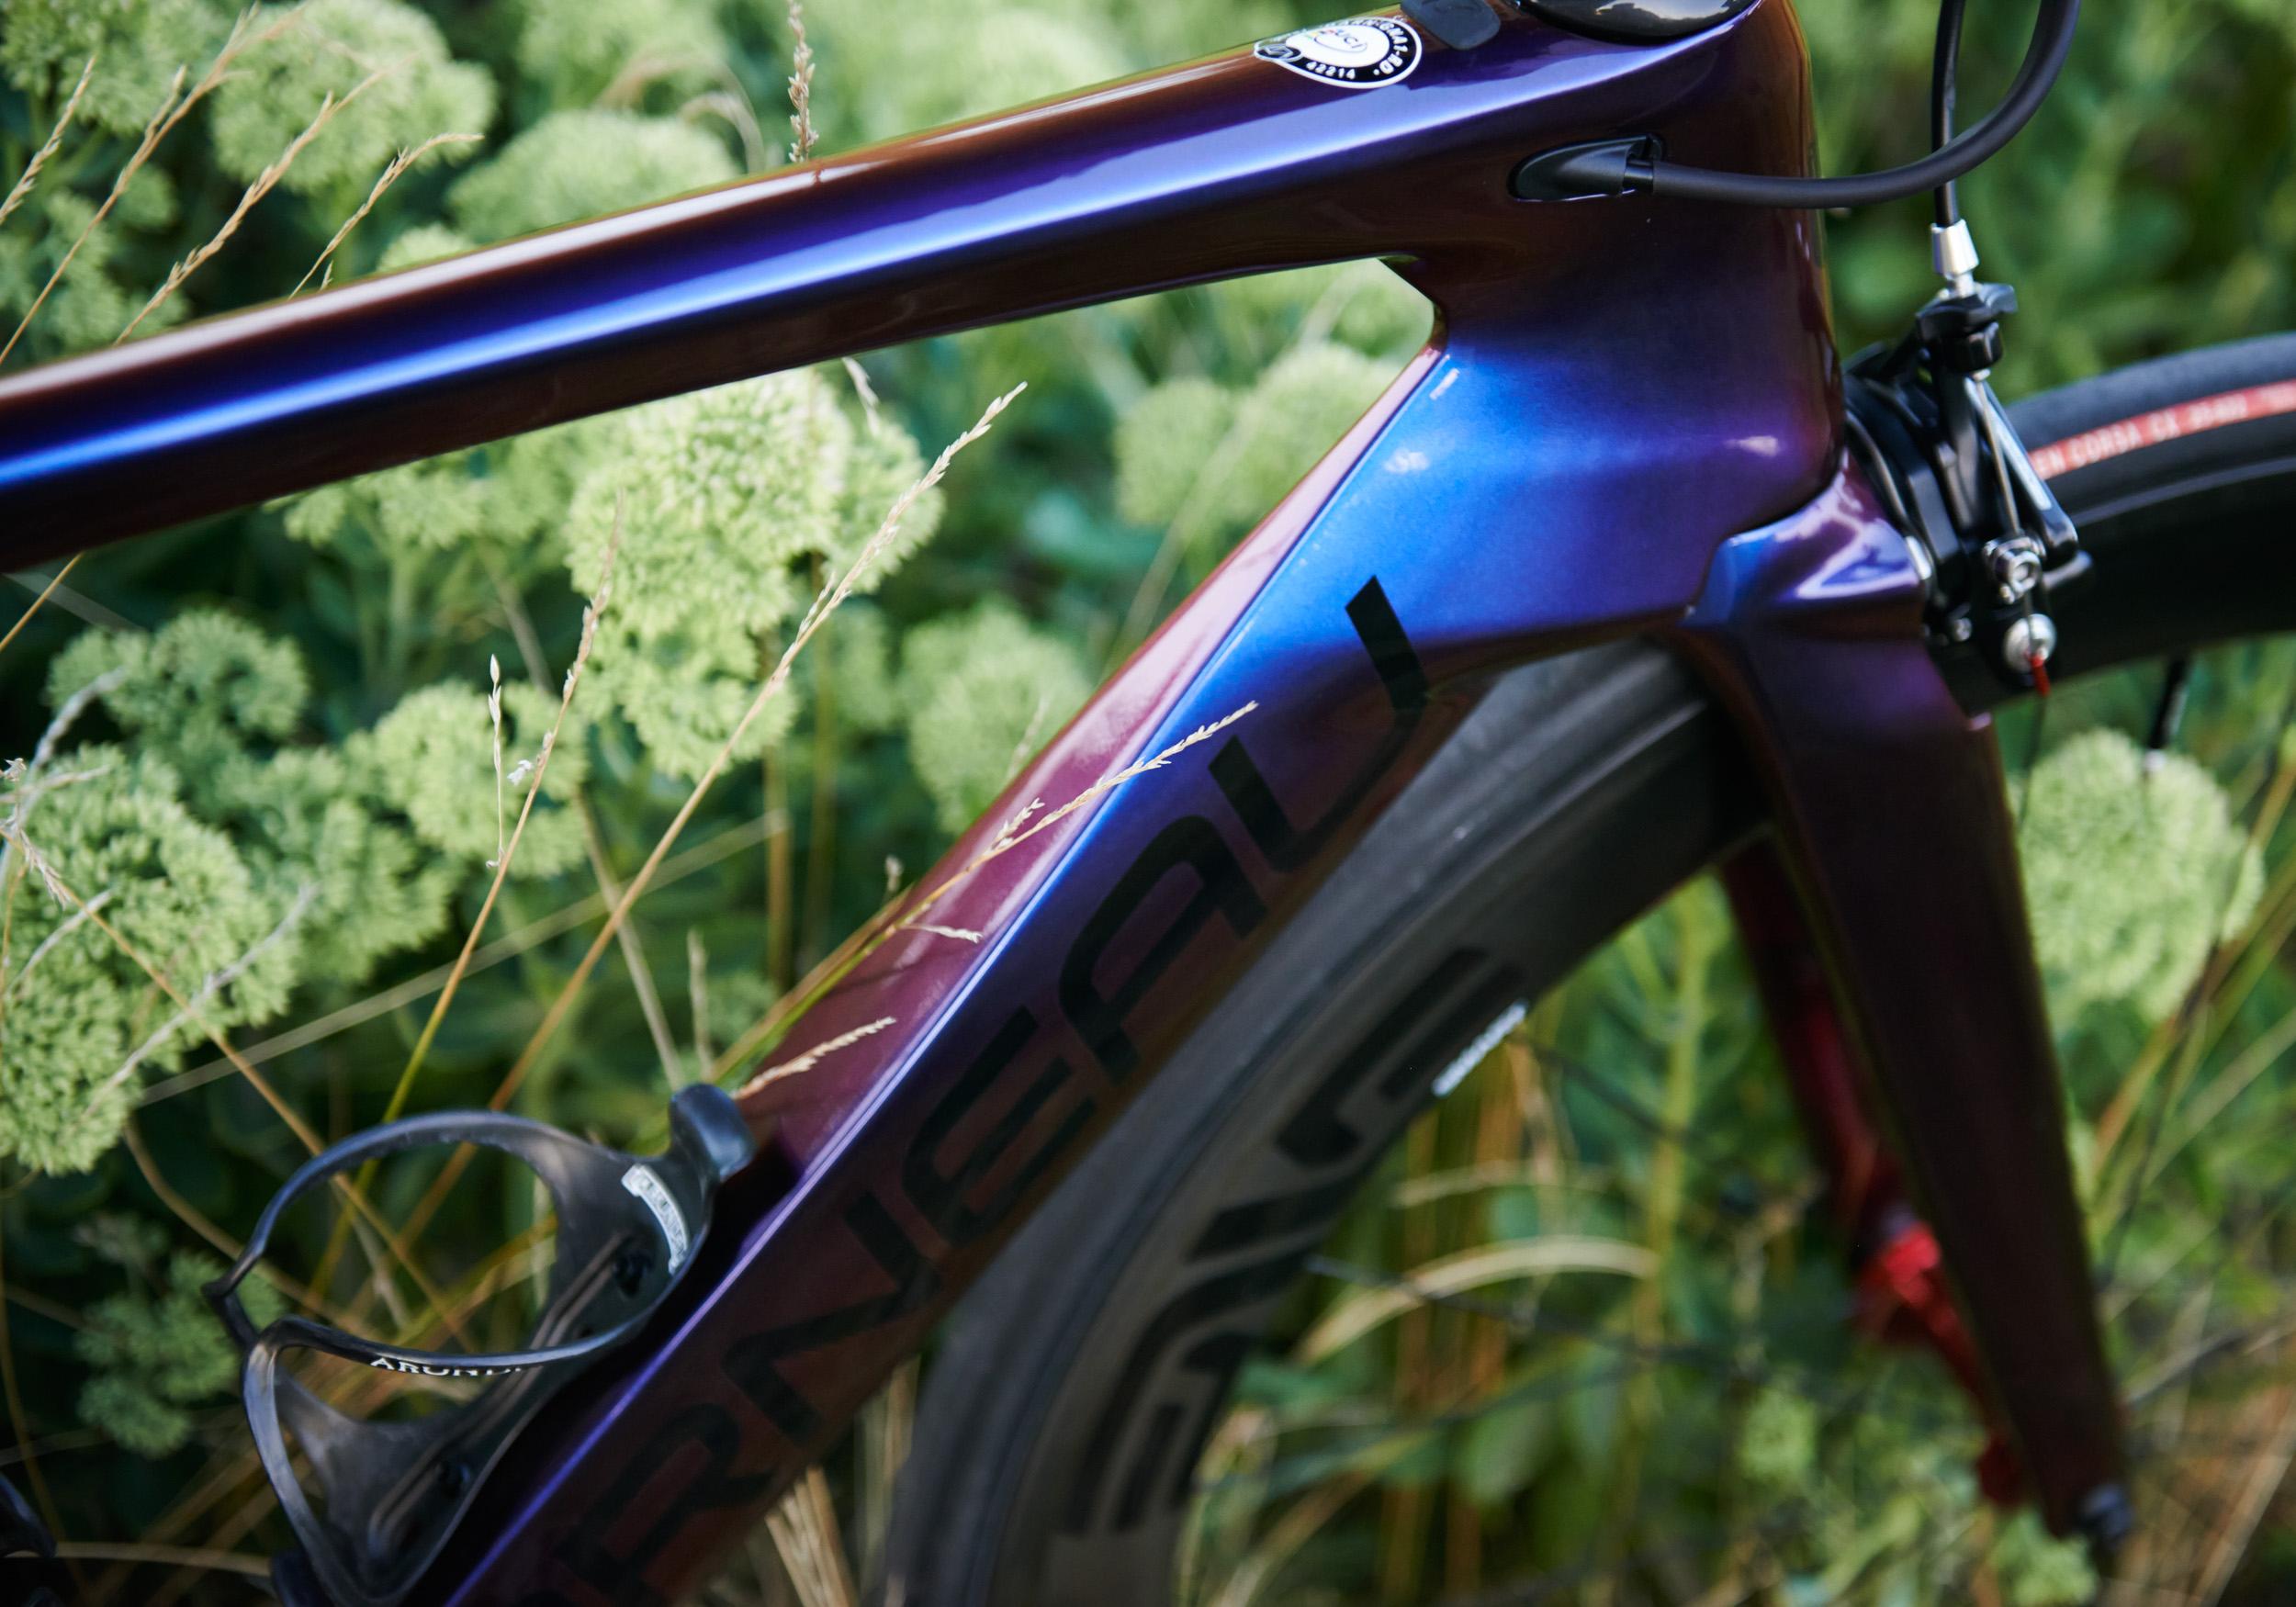 to-be-determined-garneau-a1-bike-review-109.jpg